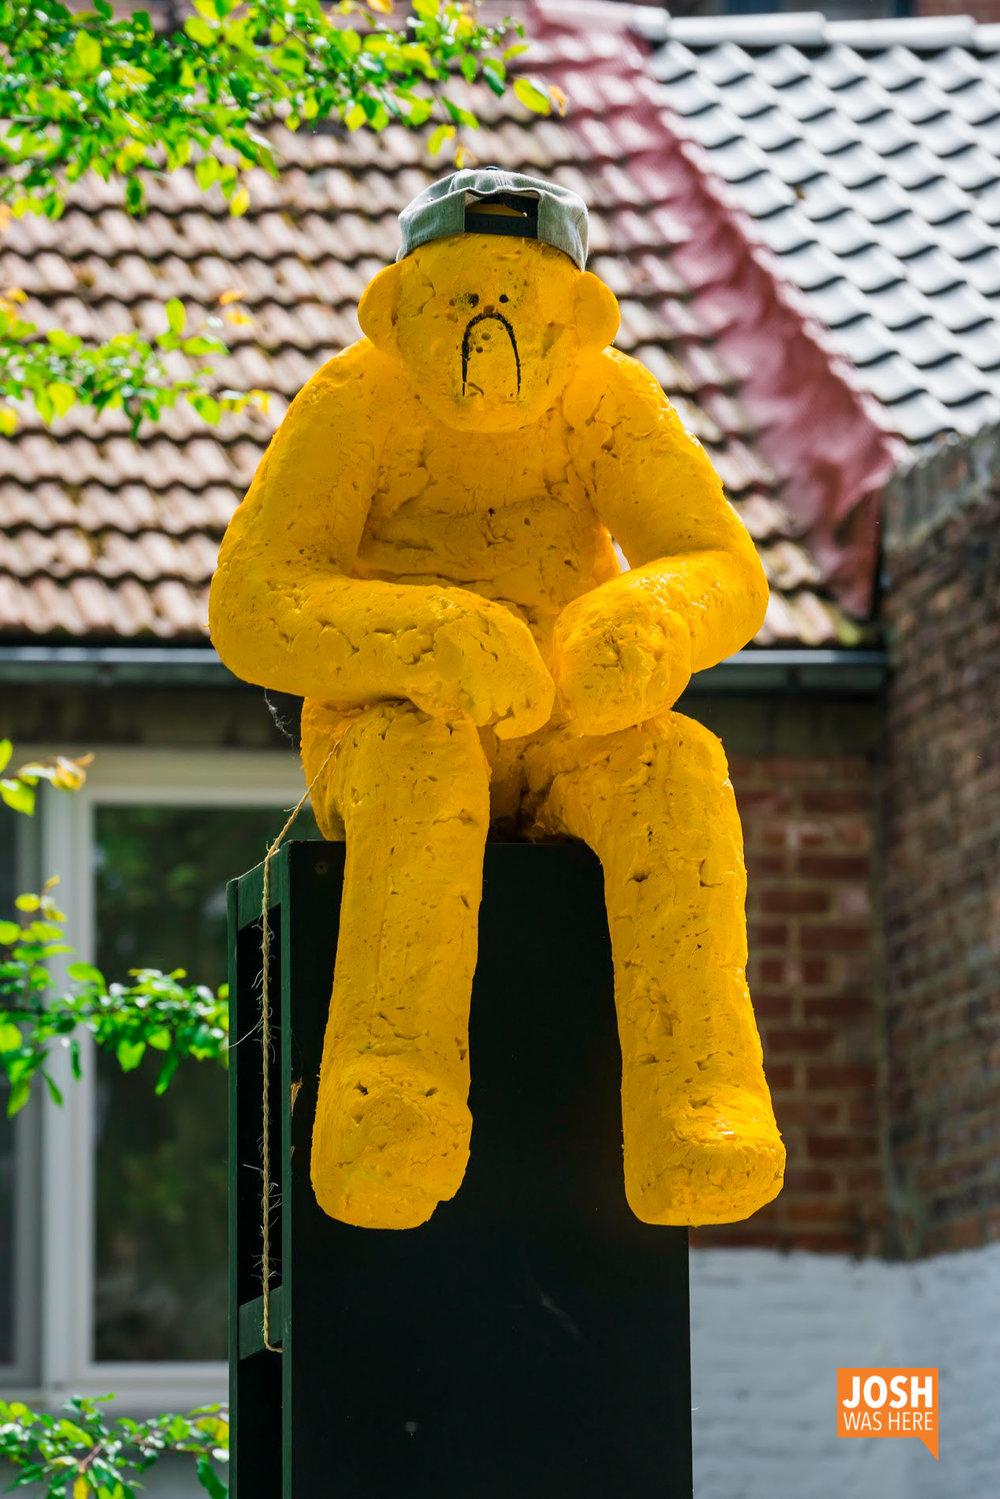 Grumpy yellow man